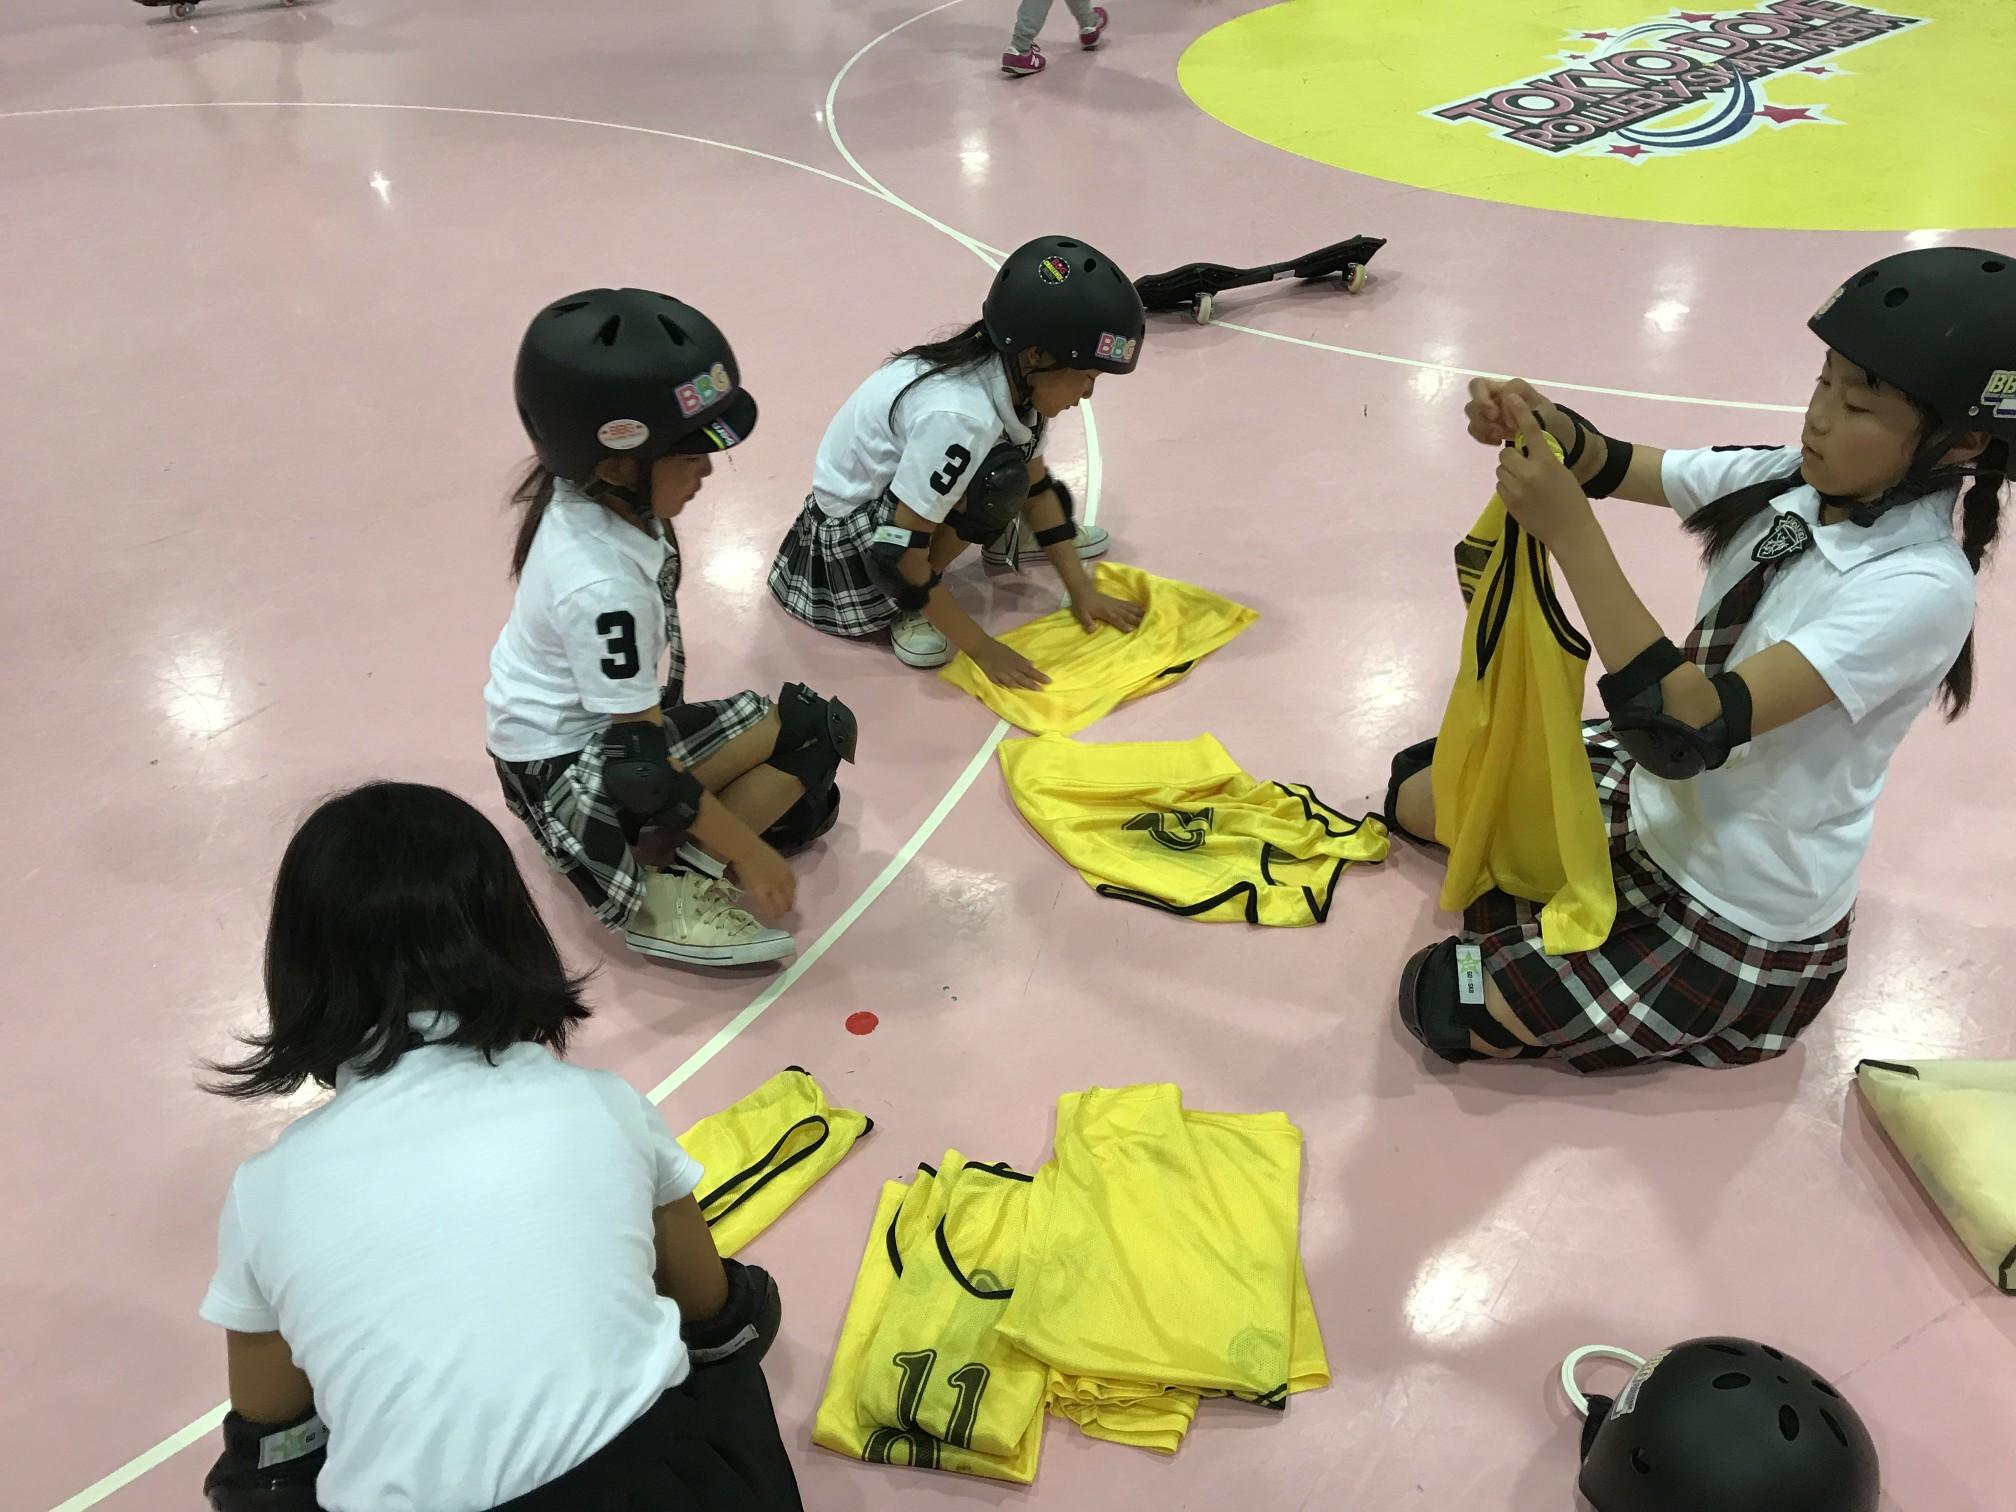 BBG東京ドームブレイブボードタイム リレー2